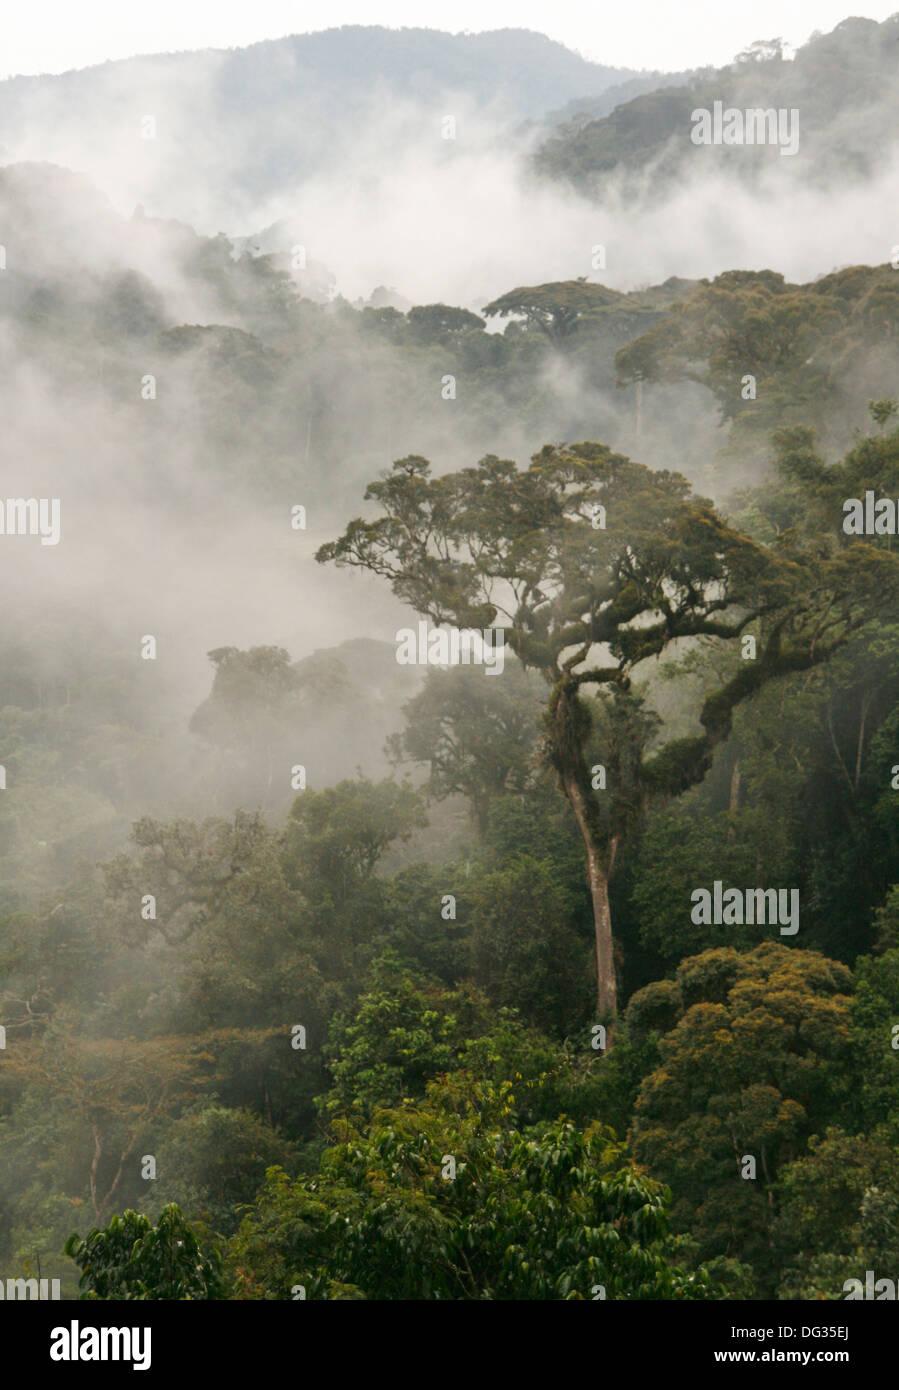 Morning mist in Nyungwe Forest National Park, near Bweyeye, Rwanda - Stock Image